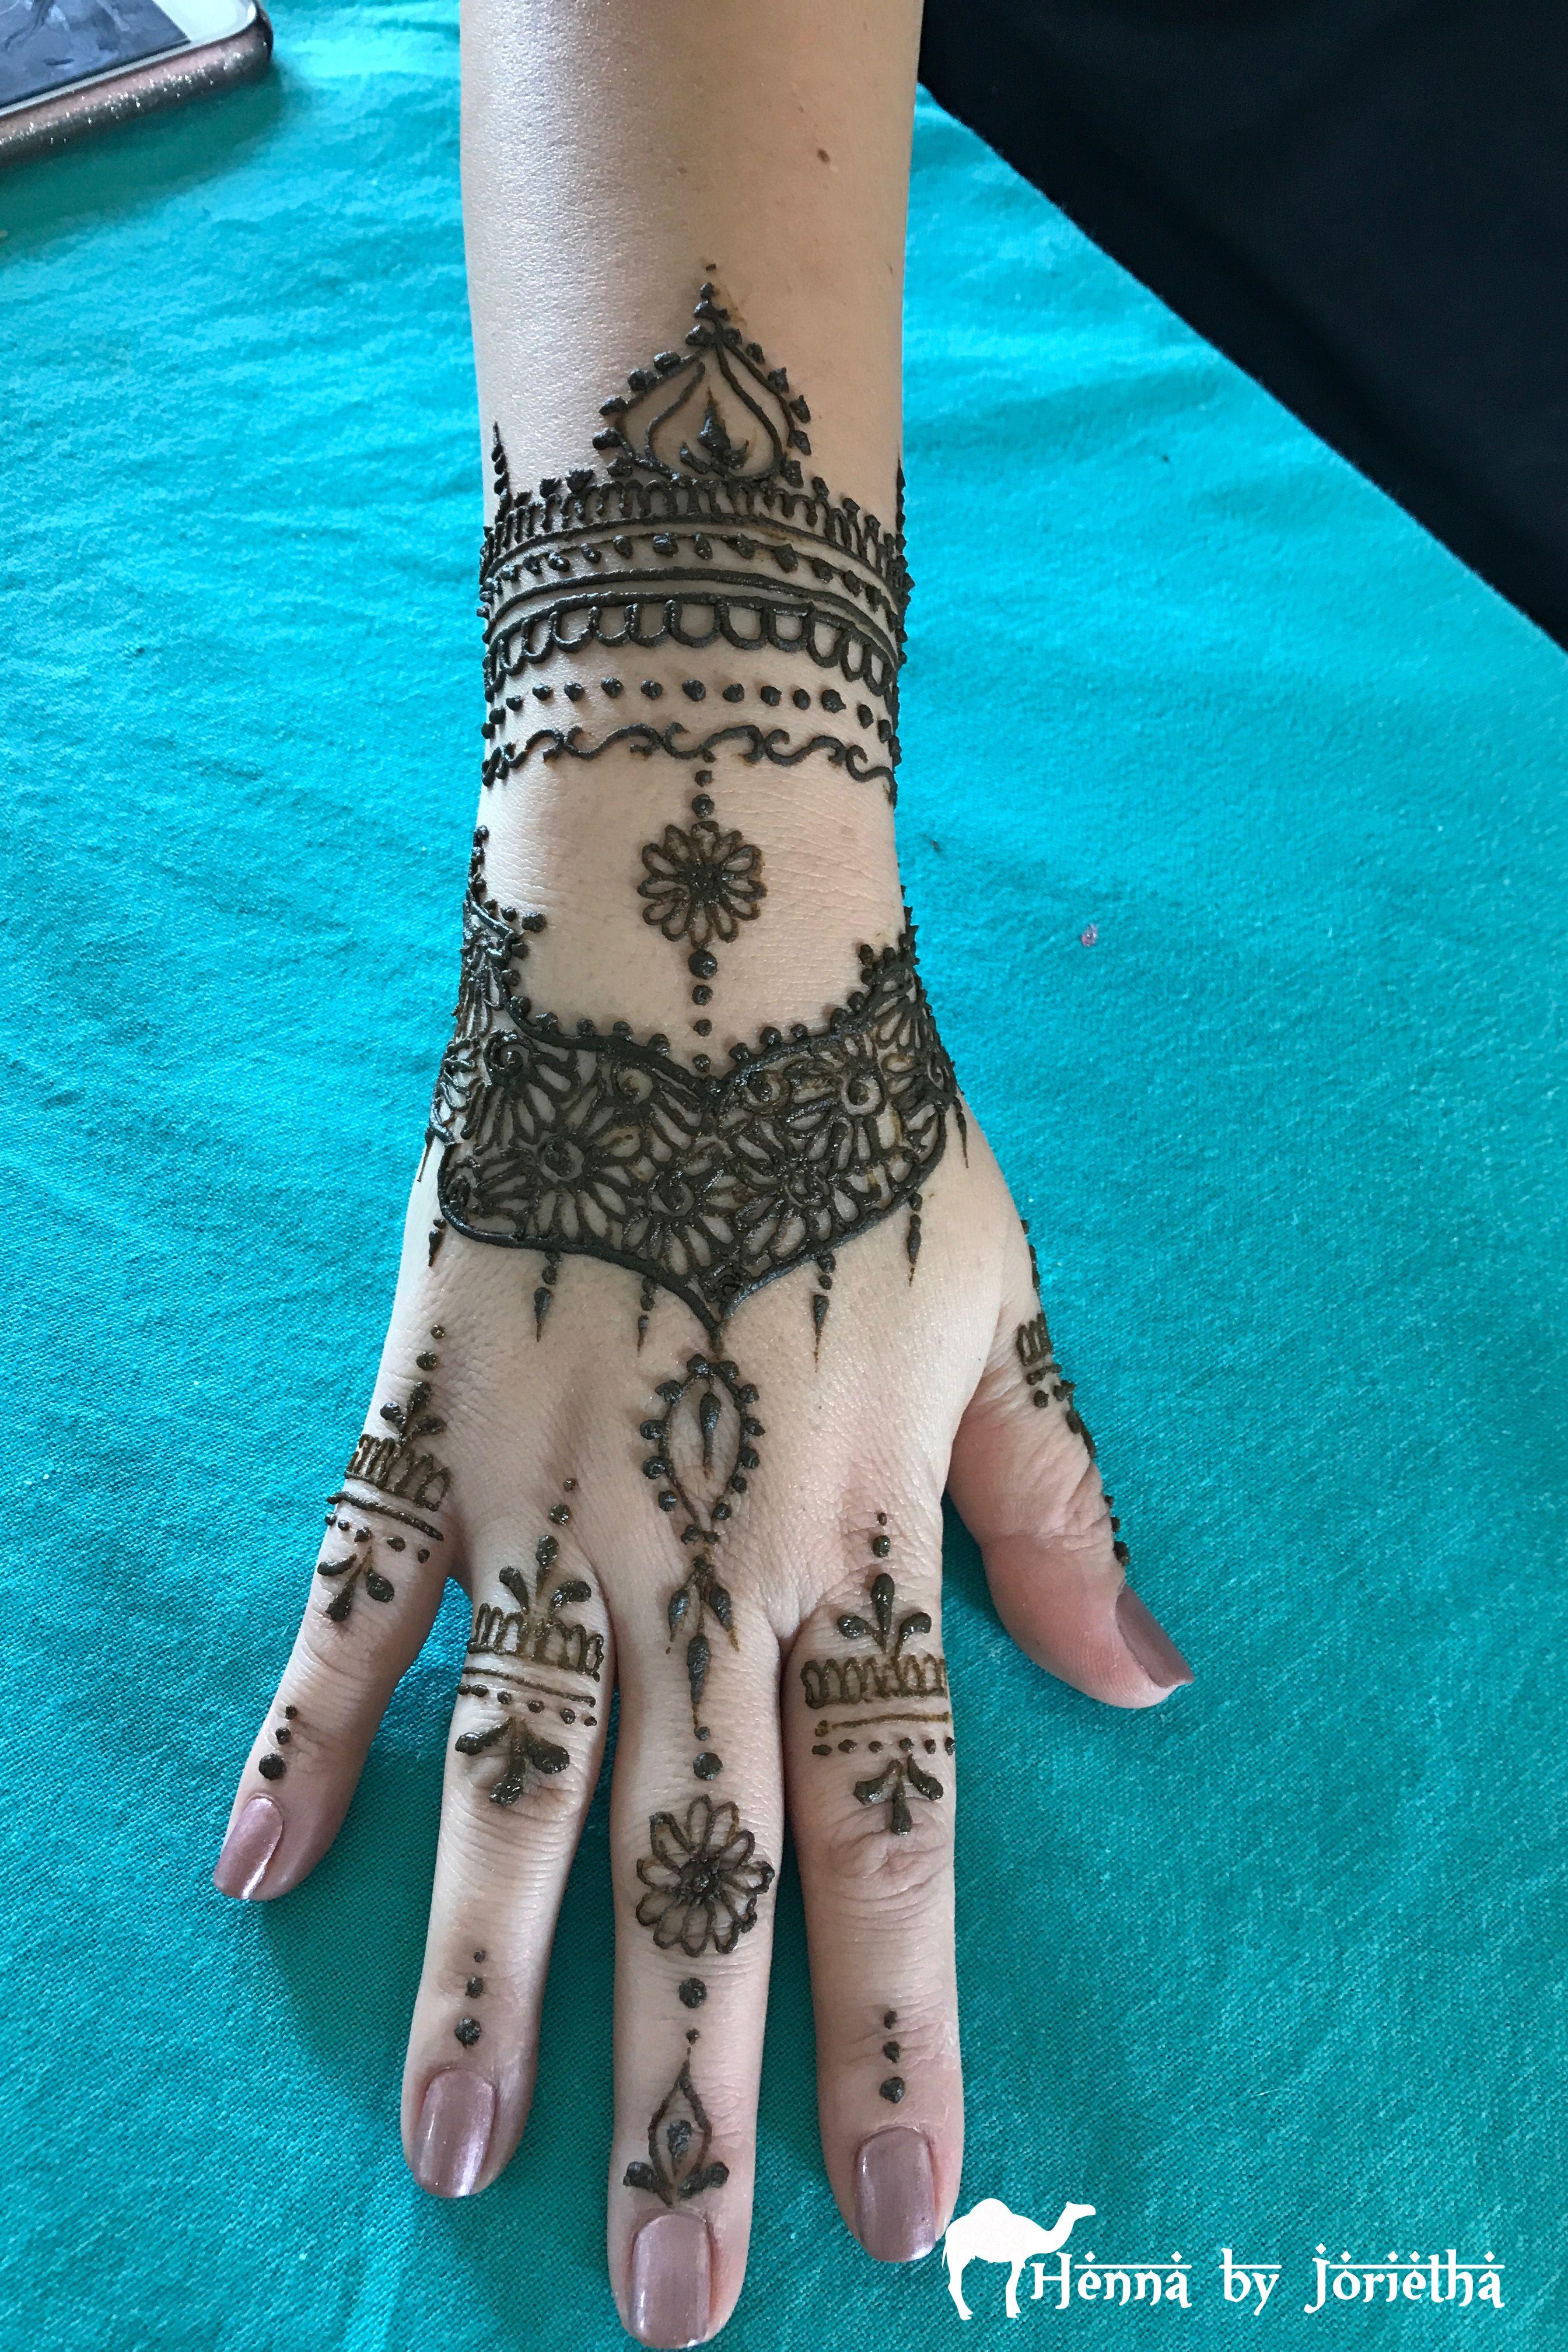 Henna Hand Henna Tattoo Henna Arm Henna In Pretoria South